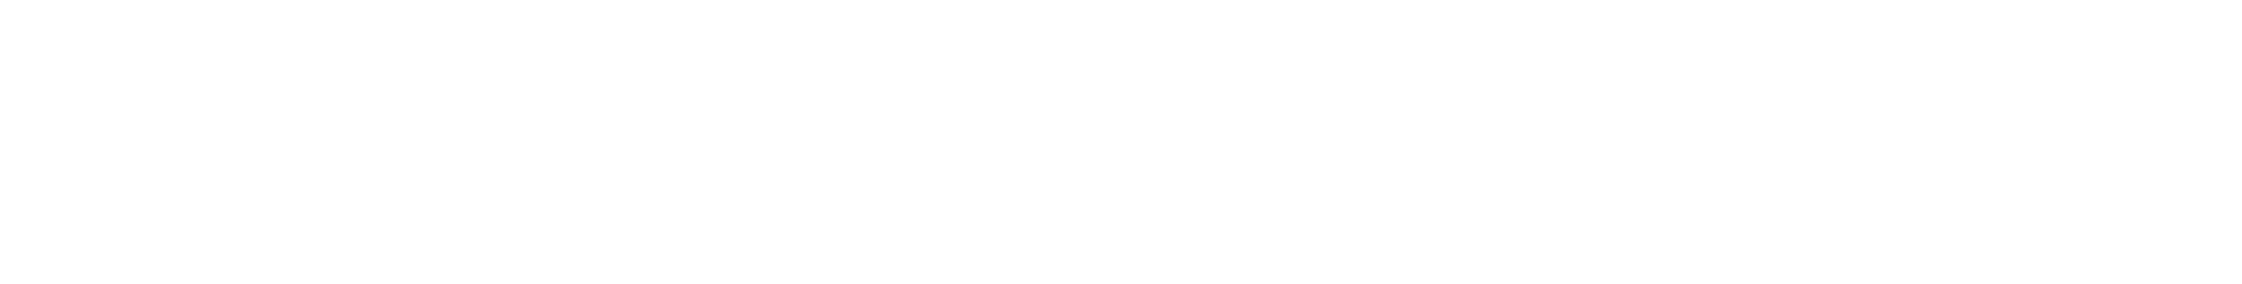 LXRGuide Logo